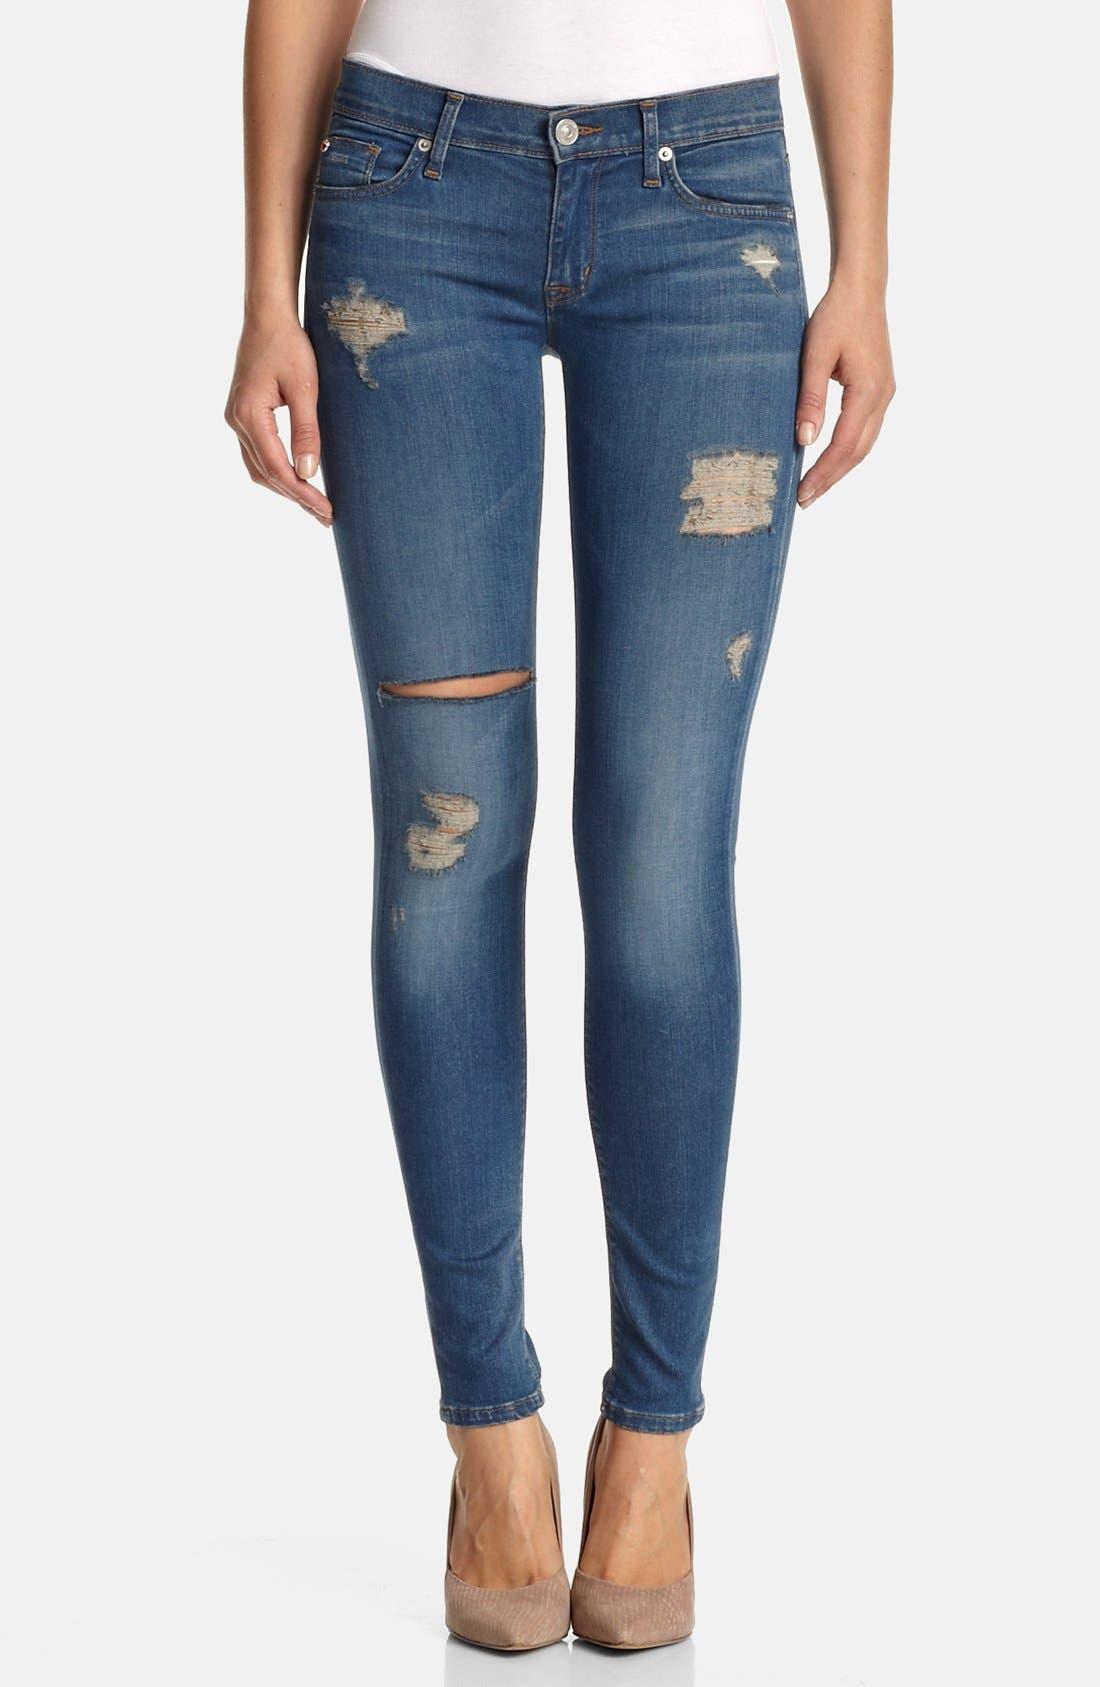 Alternate Image 1 Selected - Hudson Jeans 'Krista' Super Skinny Jeans (Foxey)